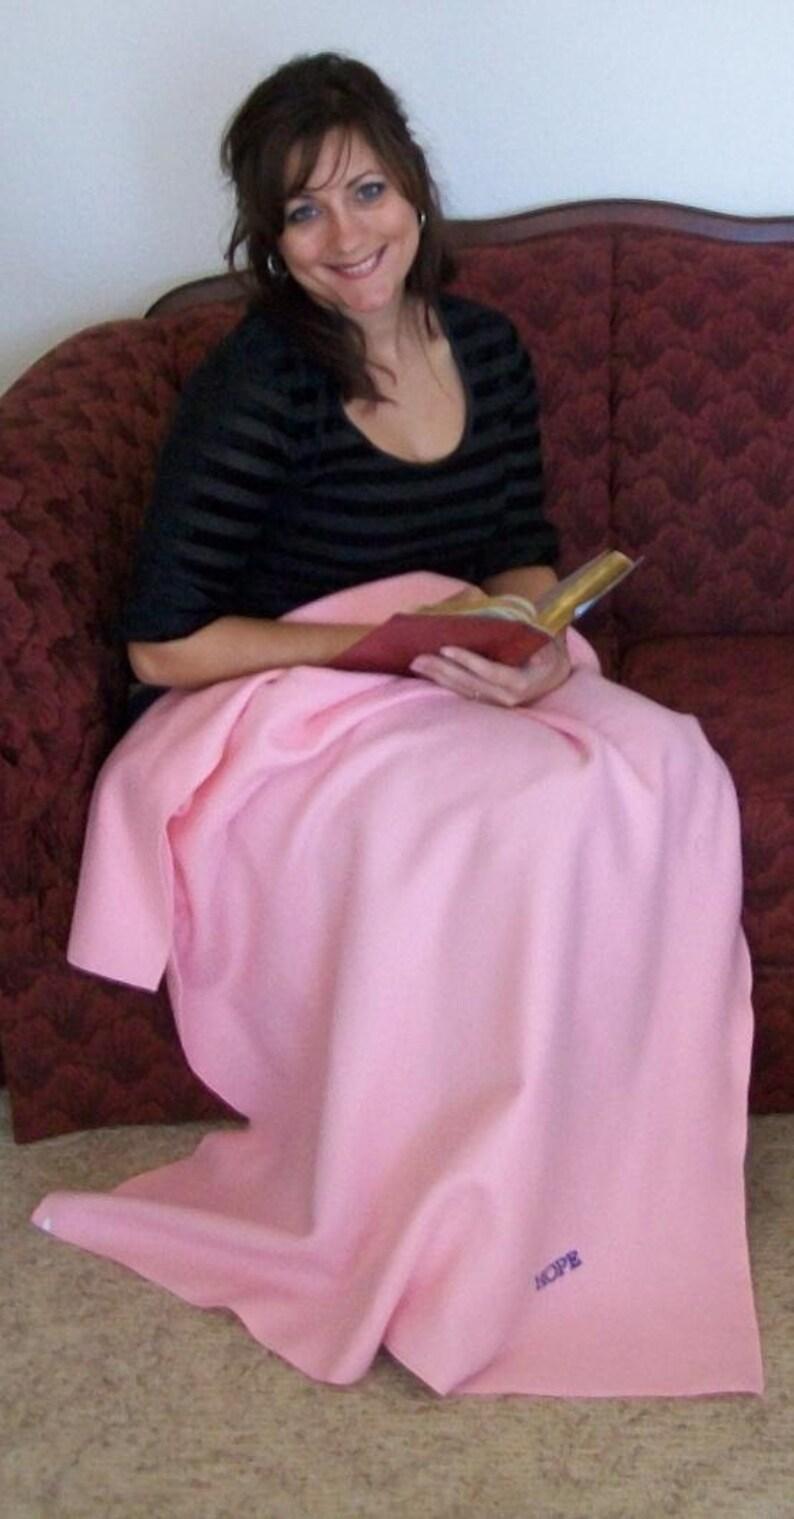 Senior Gift Cancer Survivor Gift Pink Hope Embroidered Blanket Prayer Lap Blanket Wheelchair Blanket Personalized Blanket Throw